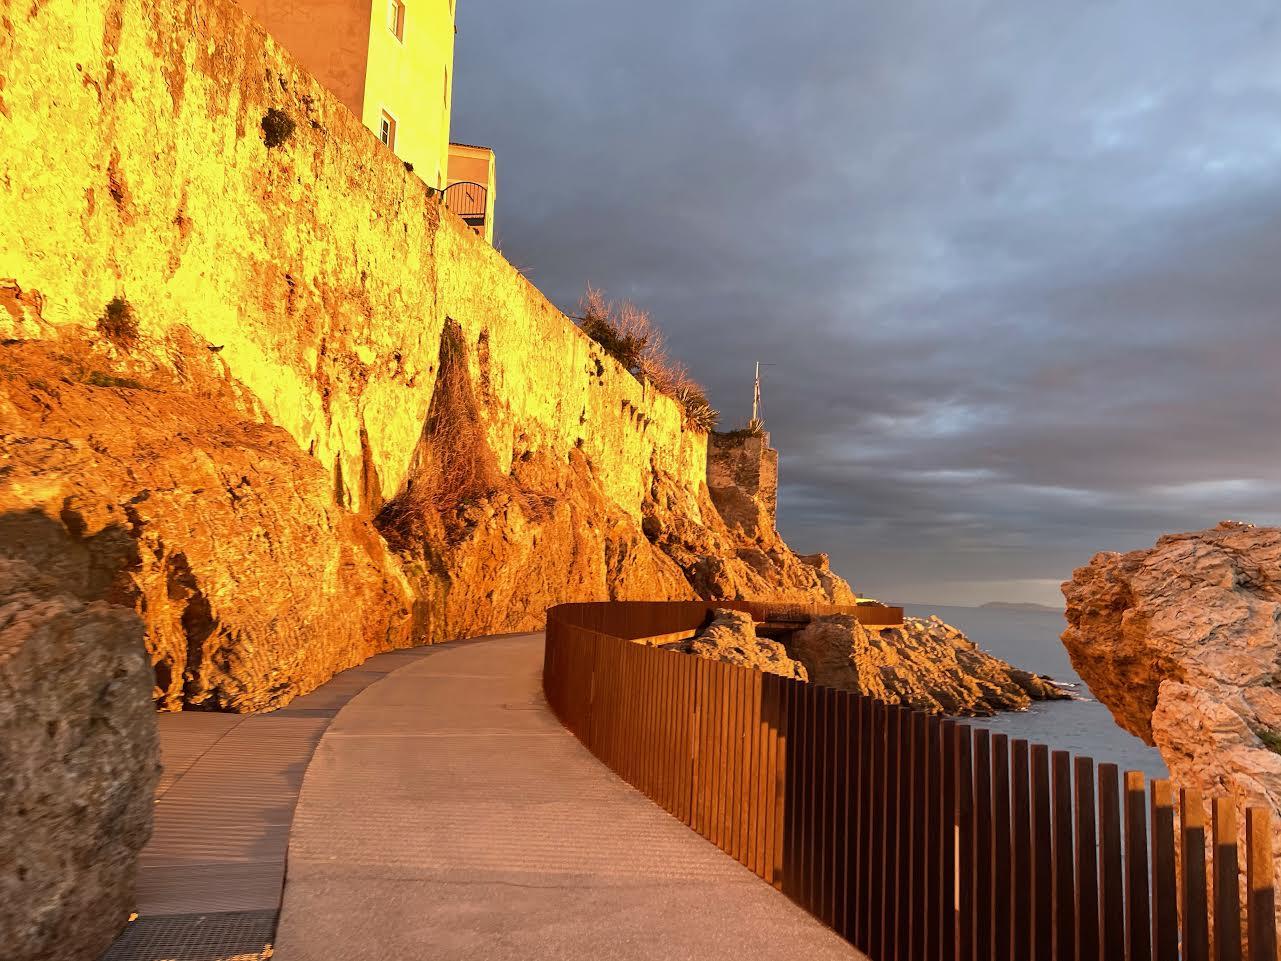 L'image du jour : l'Aldilonda di Bastia au petit matin